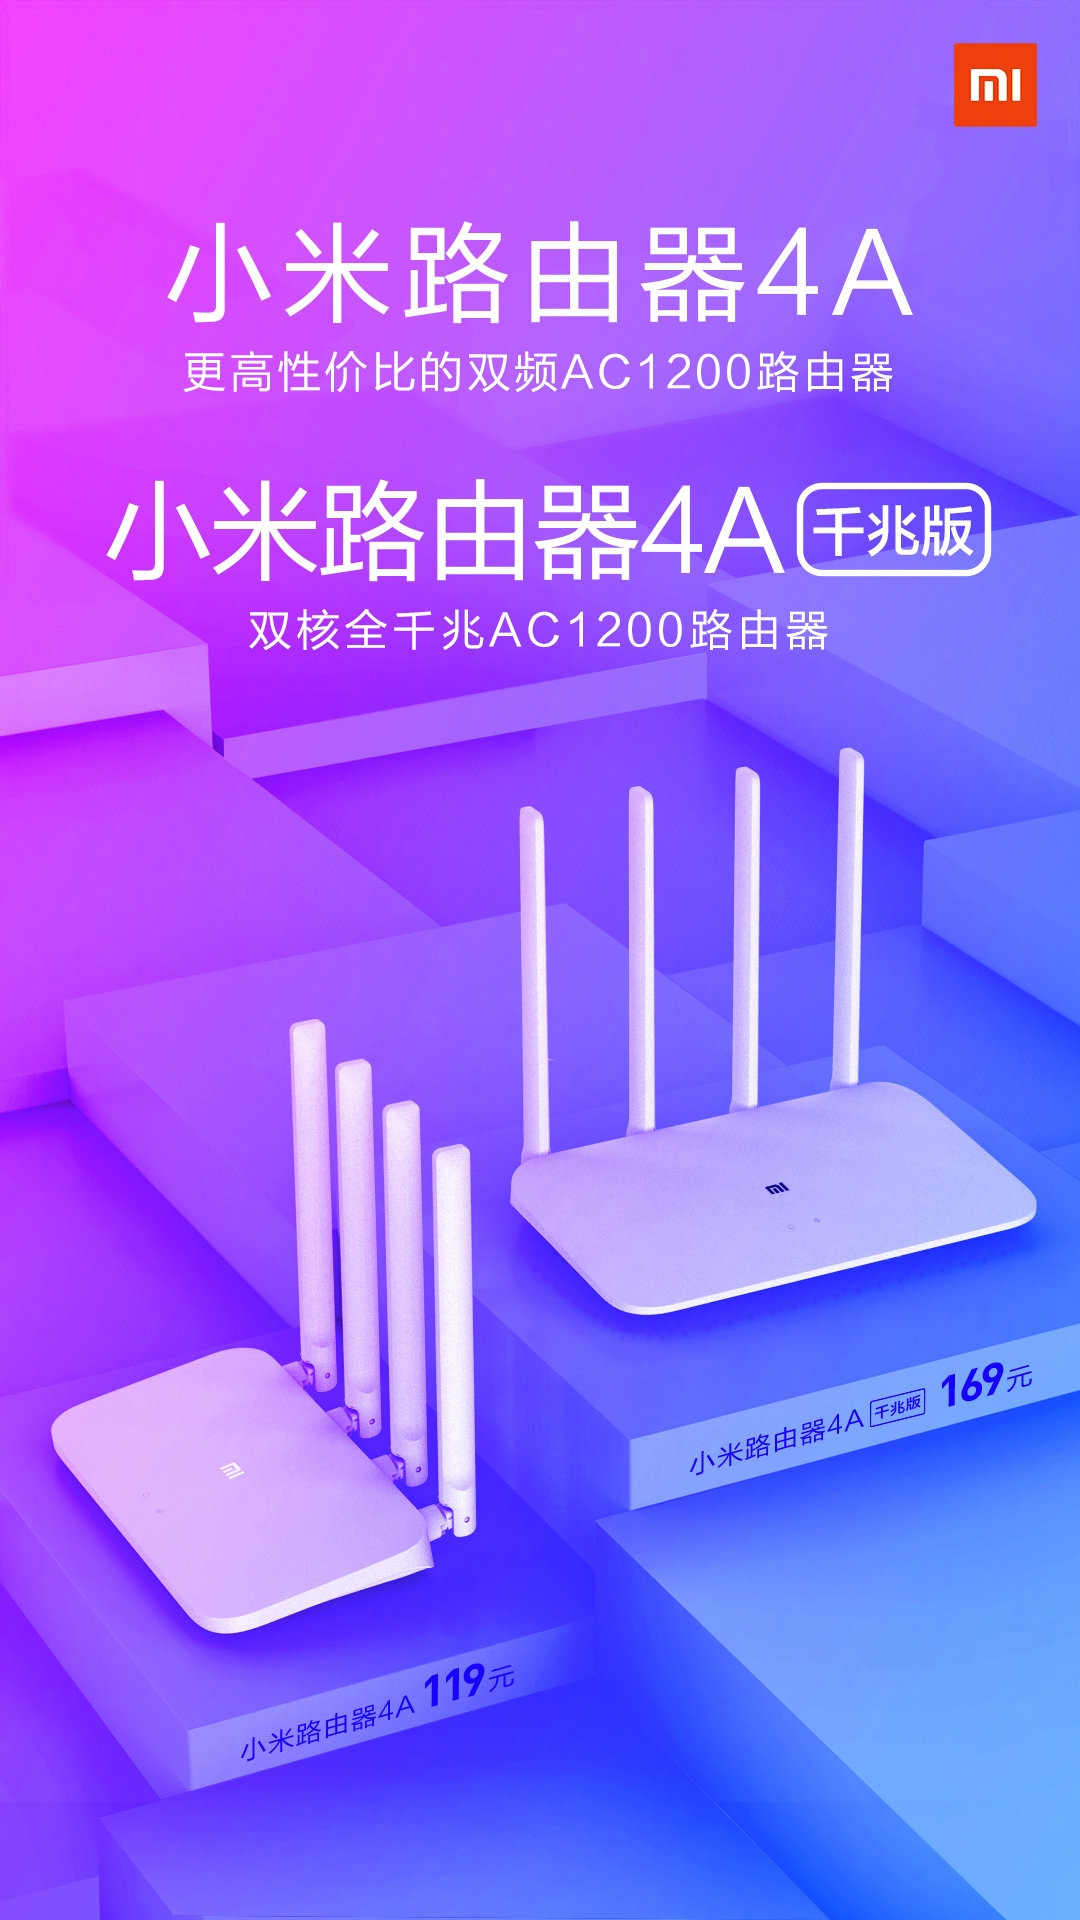 xiaomi mi router 4a gigabit 1000 ac dual band caracteristicas precio comprar noticias